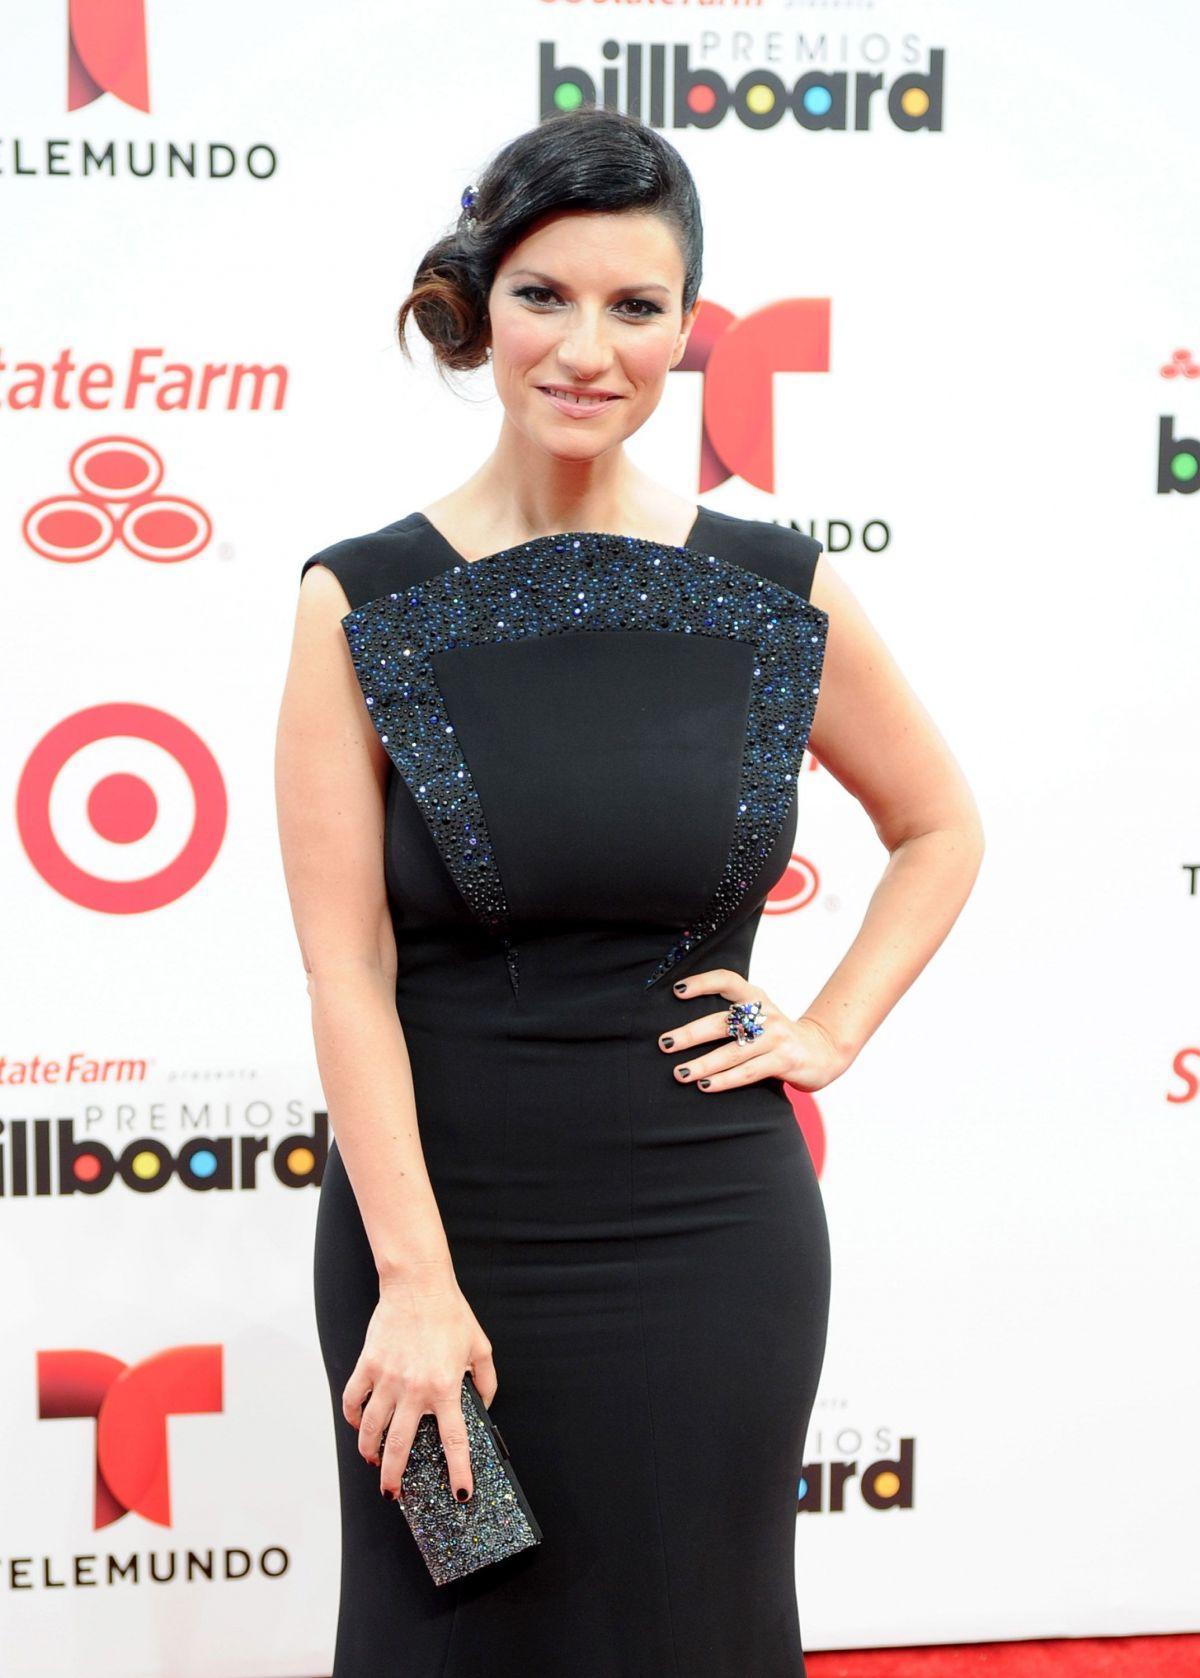 LAURA PAUSINI at 2014 Billboard Latin Music Awards in Miami